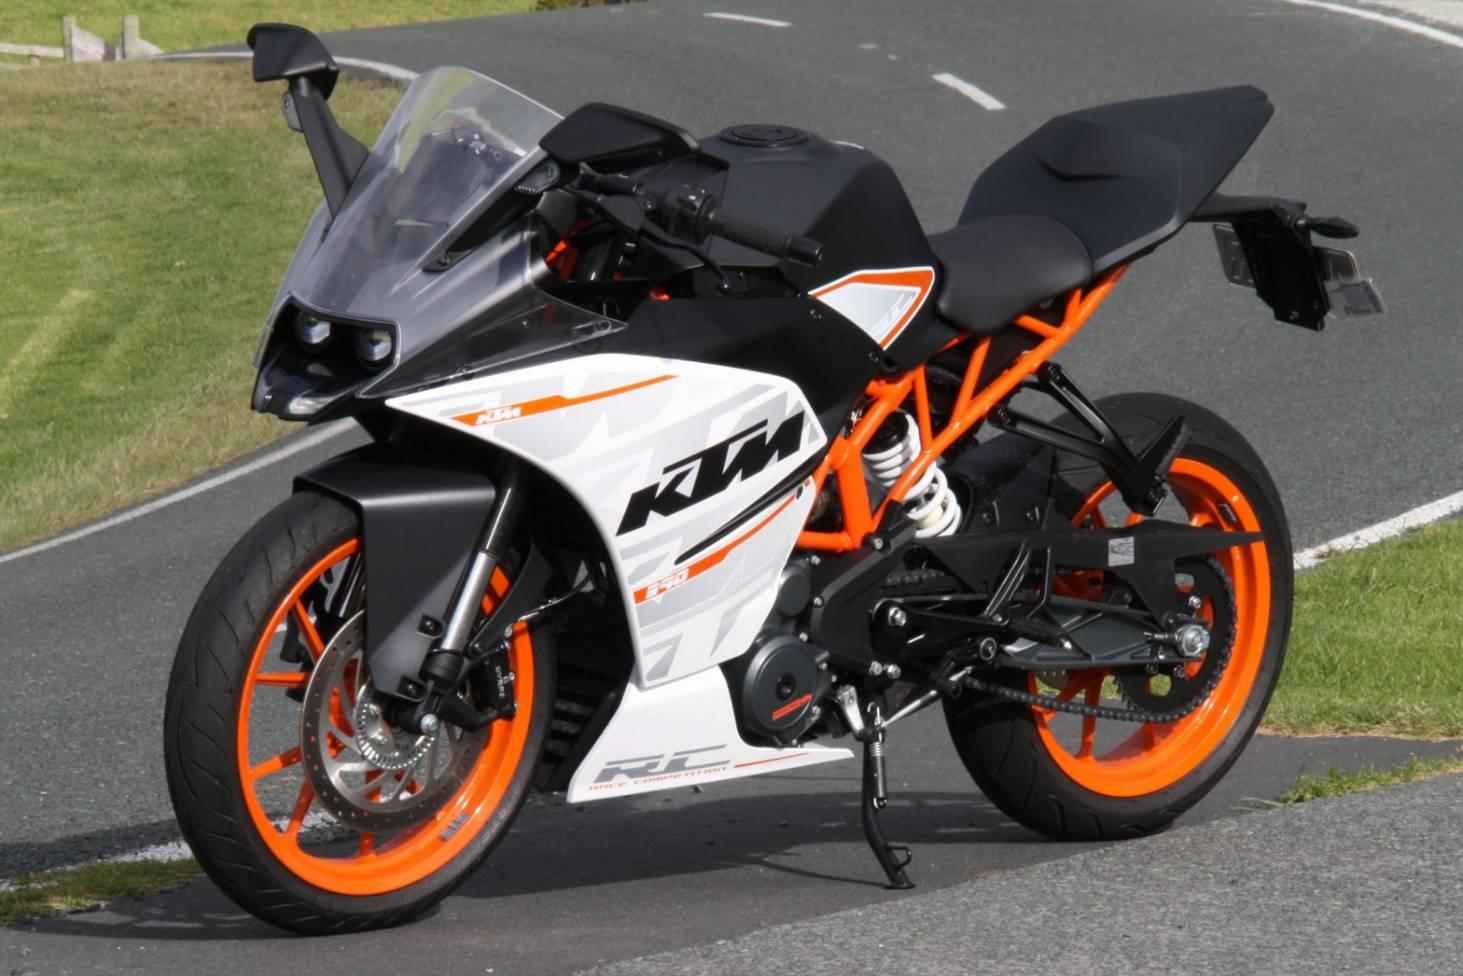 Ktm Rc390 Is A Commuter Bike That Thinks It S A Racer Stuff Co Nz